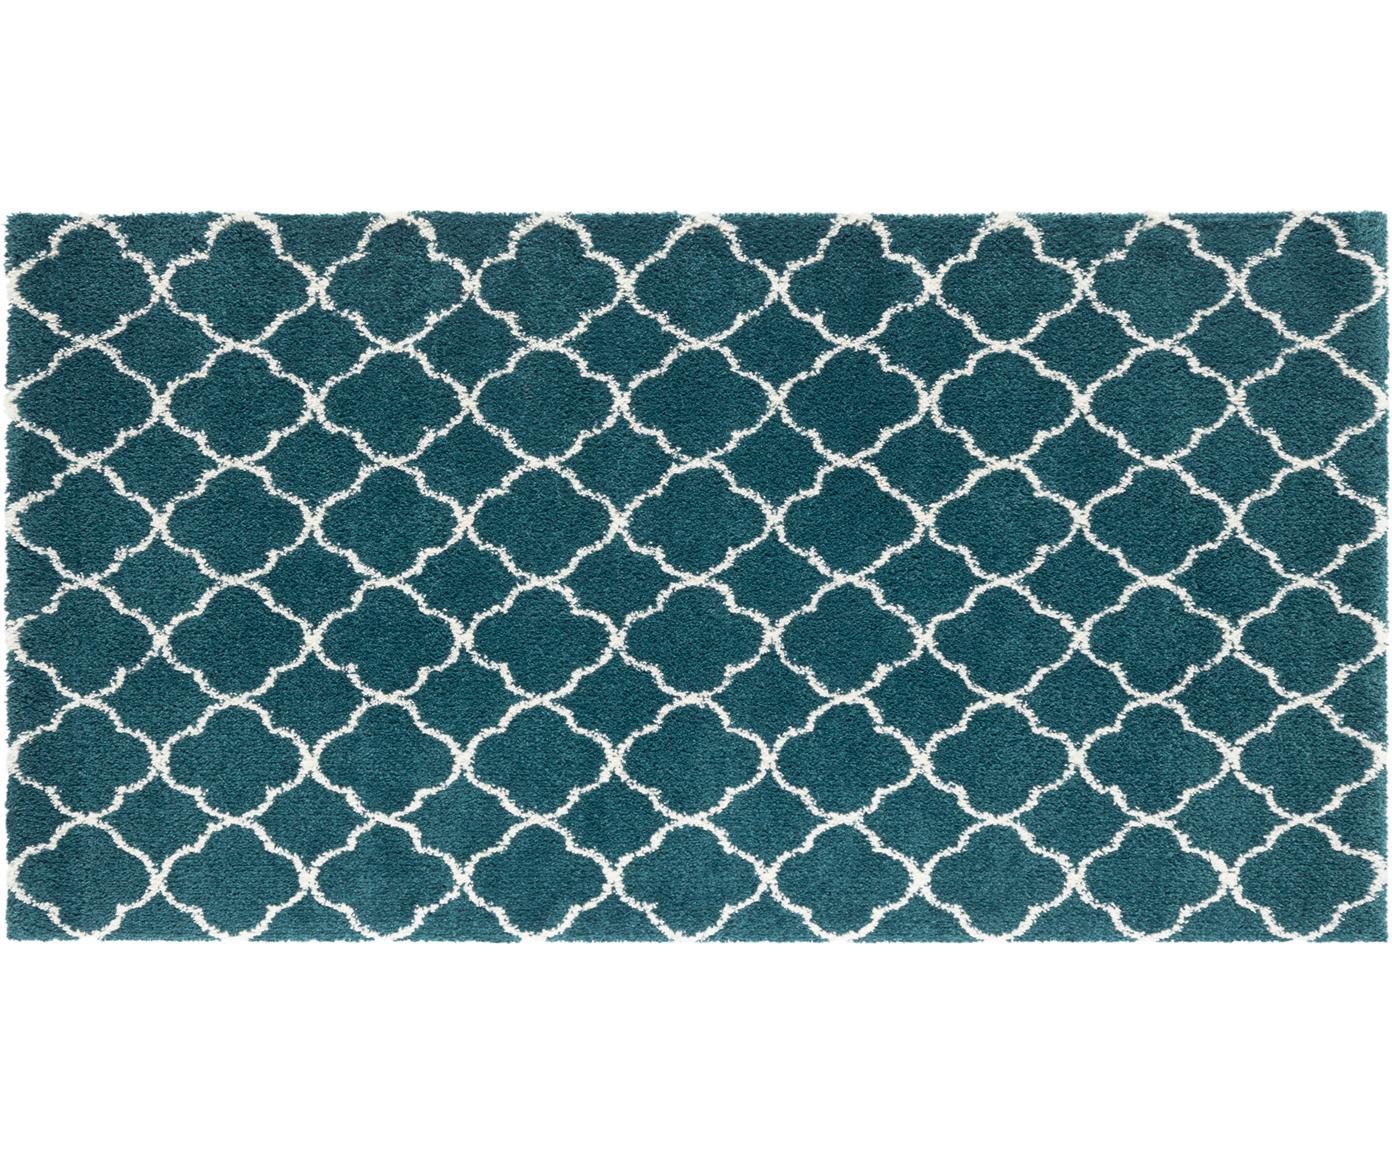 Hochflor-Teppich Grace in Petrol/Creme, Flor: 100% Polypropylen, Petrolgrün, Cremefarben, B 80 x L 150 cm (Größe XS)